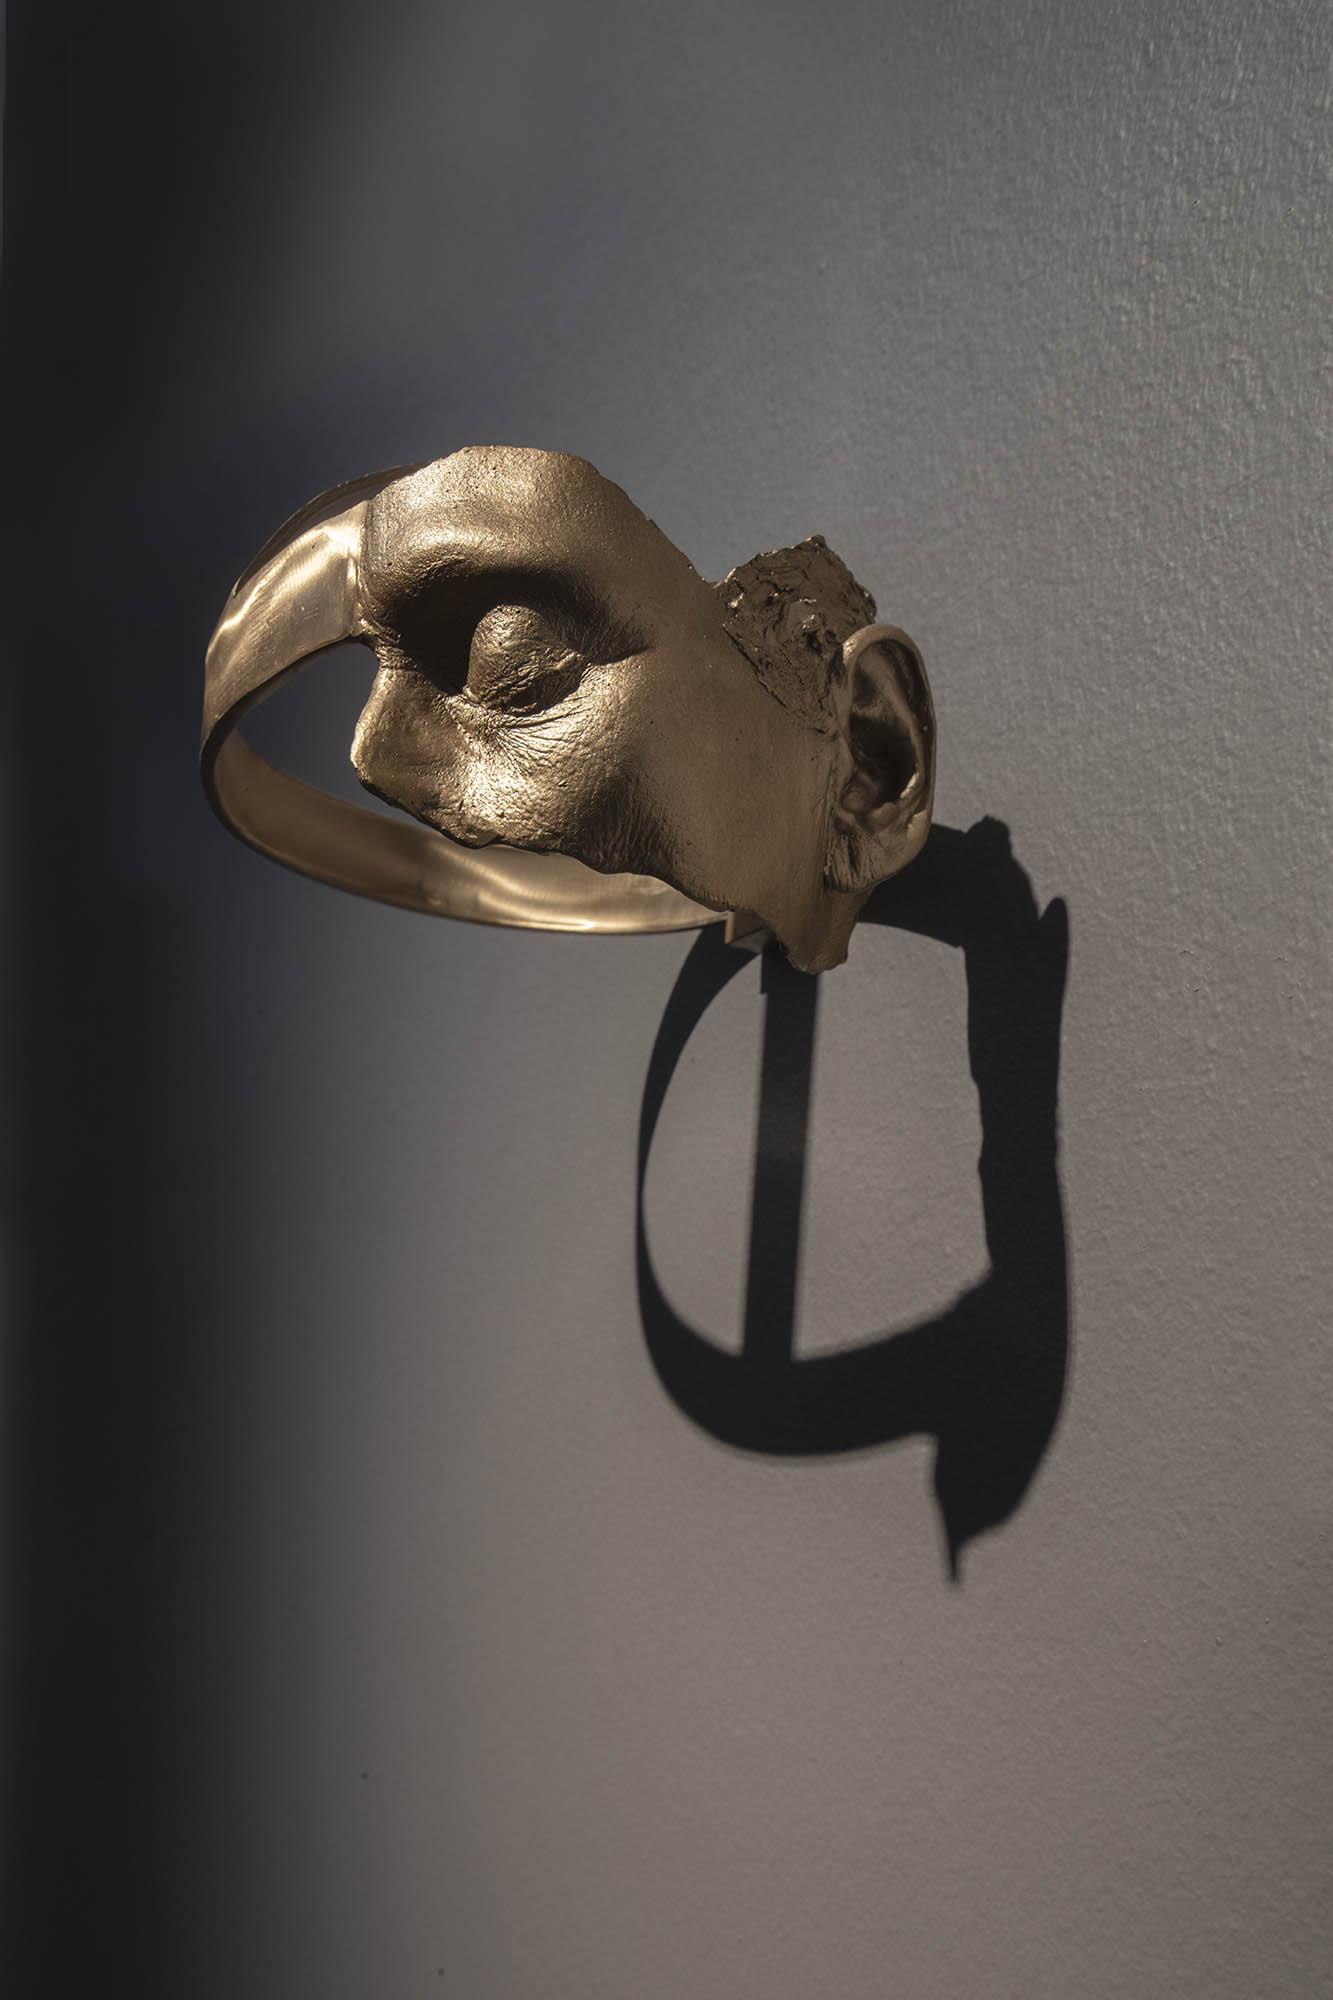 "JULIE RRAP  ""Turning a Blind Eye and Deaf Ear"" Helmet,  2019 Bronze, edition of 3  13 x 20 x 24 cm Photograph by John Gollings"